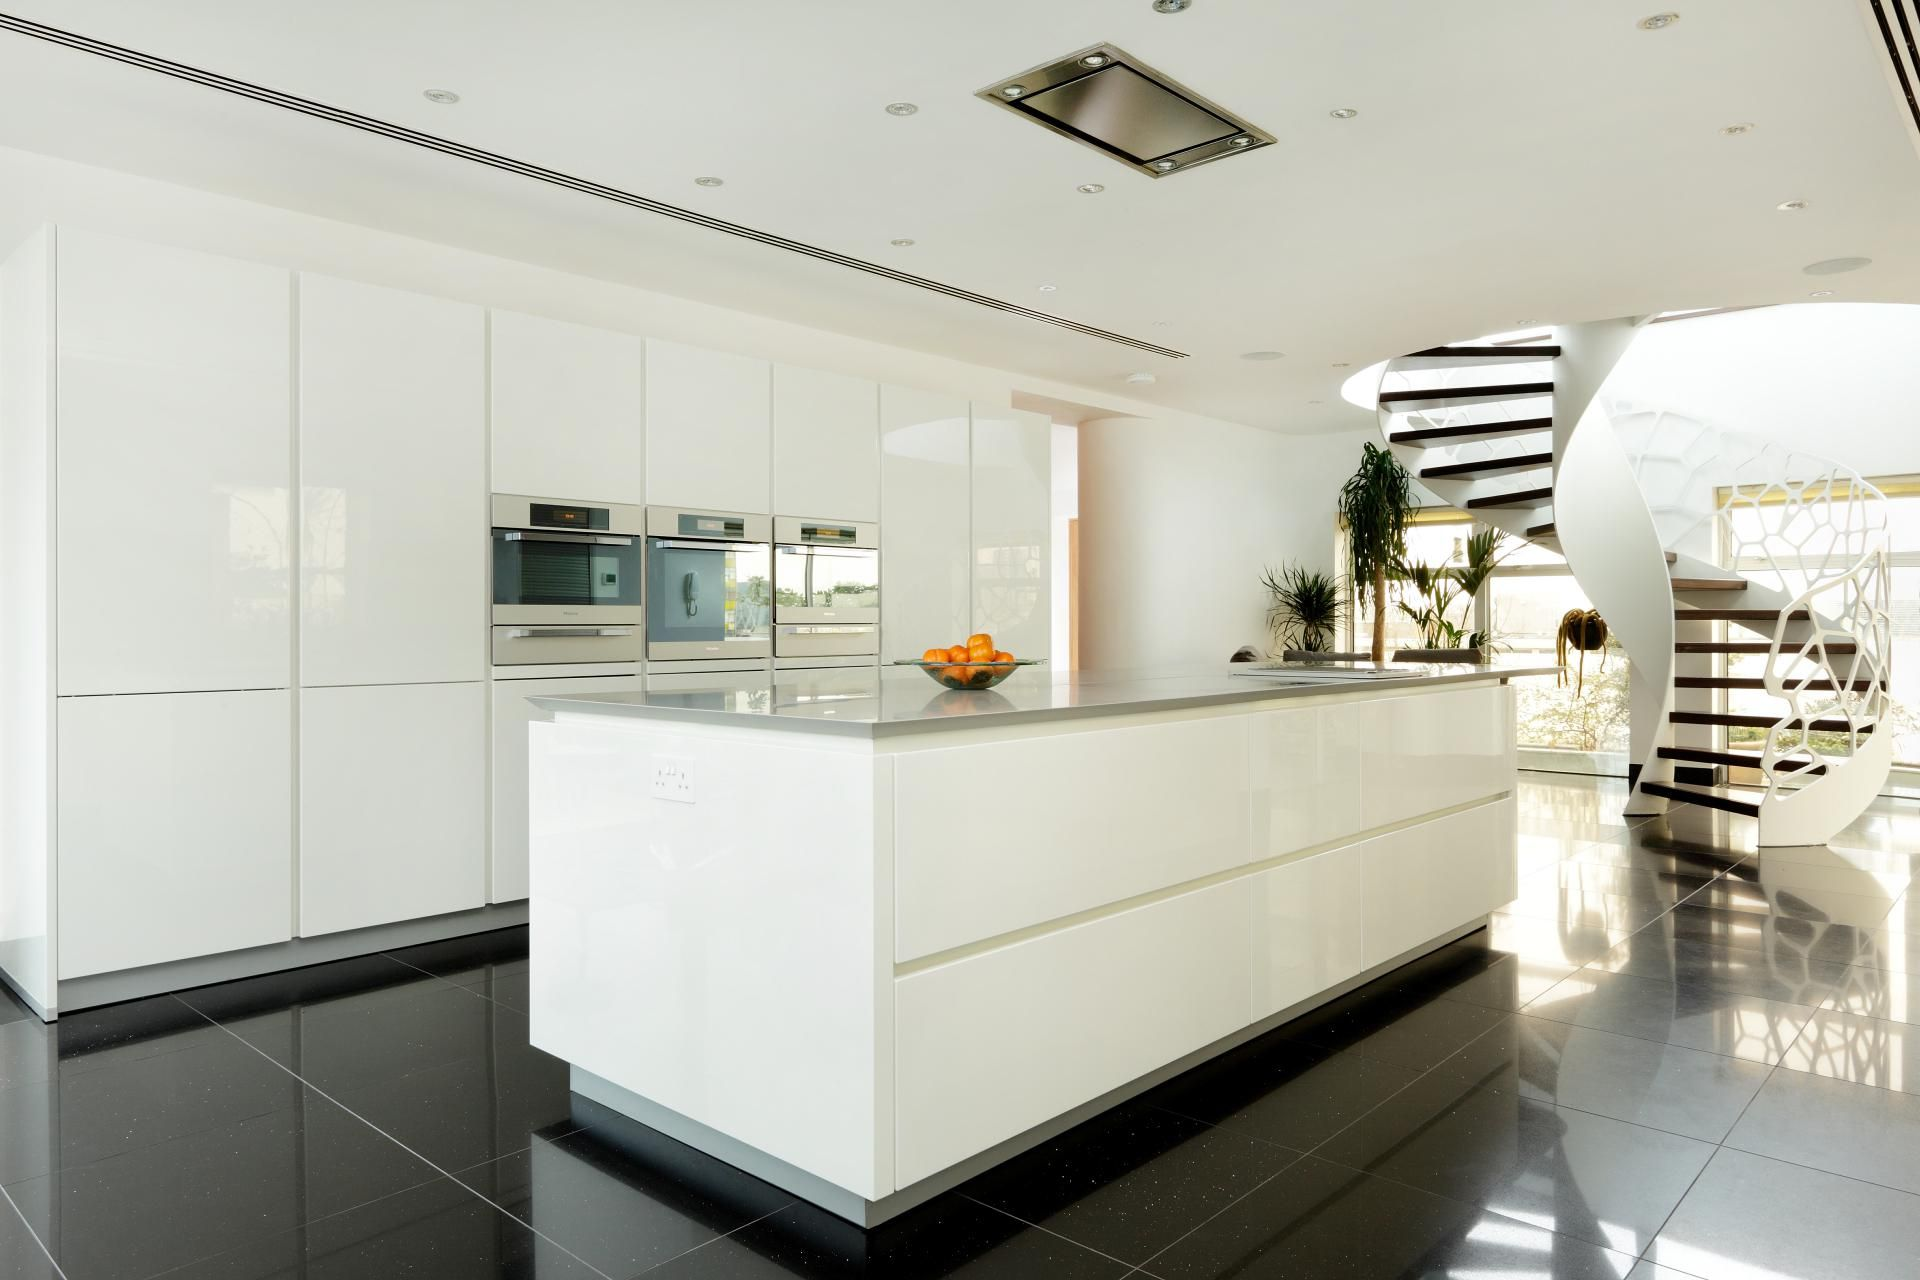 About alno modern kitchens on pinterest modern kitchen cabinets - Barbican Alno Star Highline High Gloss White Kitchen Miele Appliances Corian Worktops Barbican Alno Star Highline High Gloss W